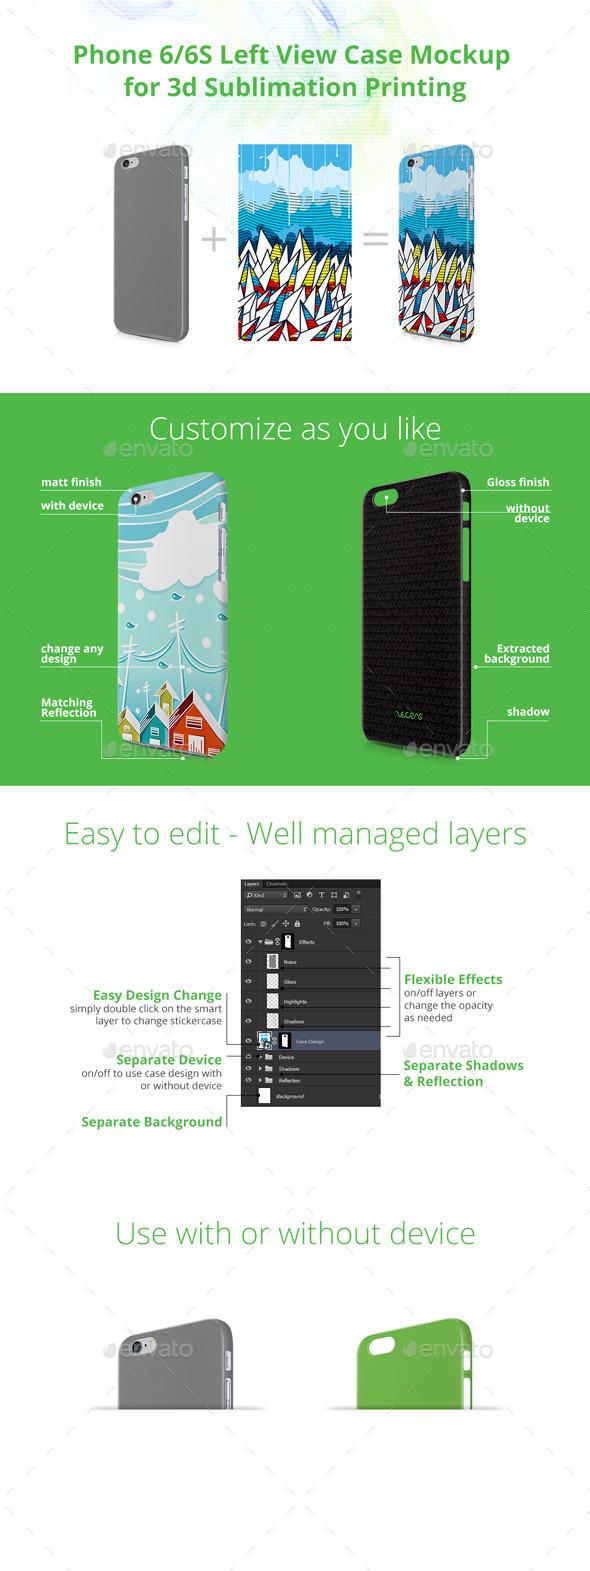 Phone 6/6S Case Design Mock-up for 3d Sublimation Printing - Left View - Mobile Displays